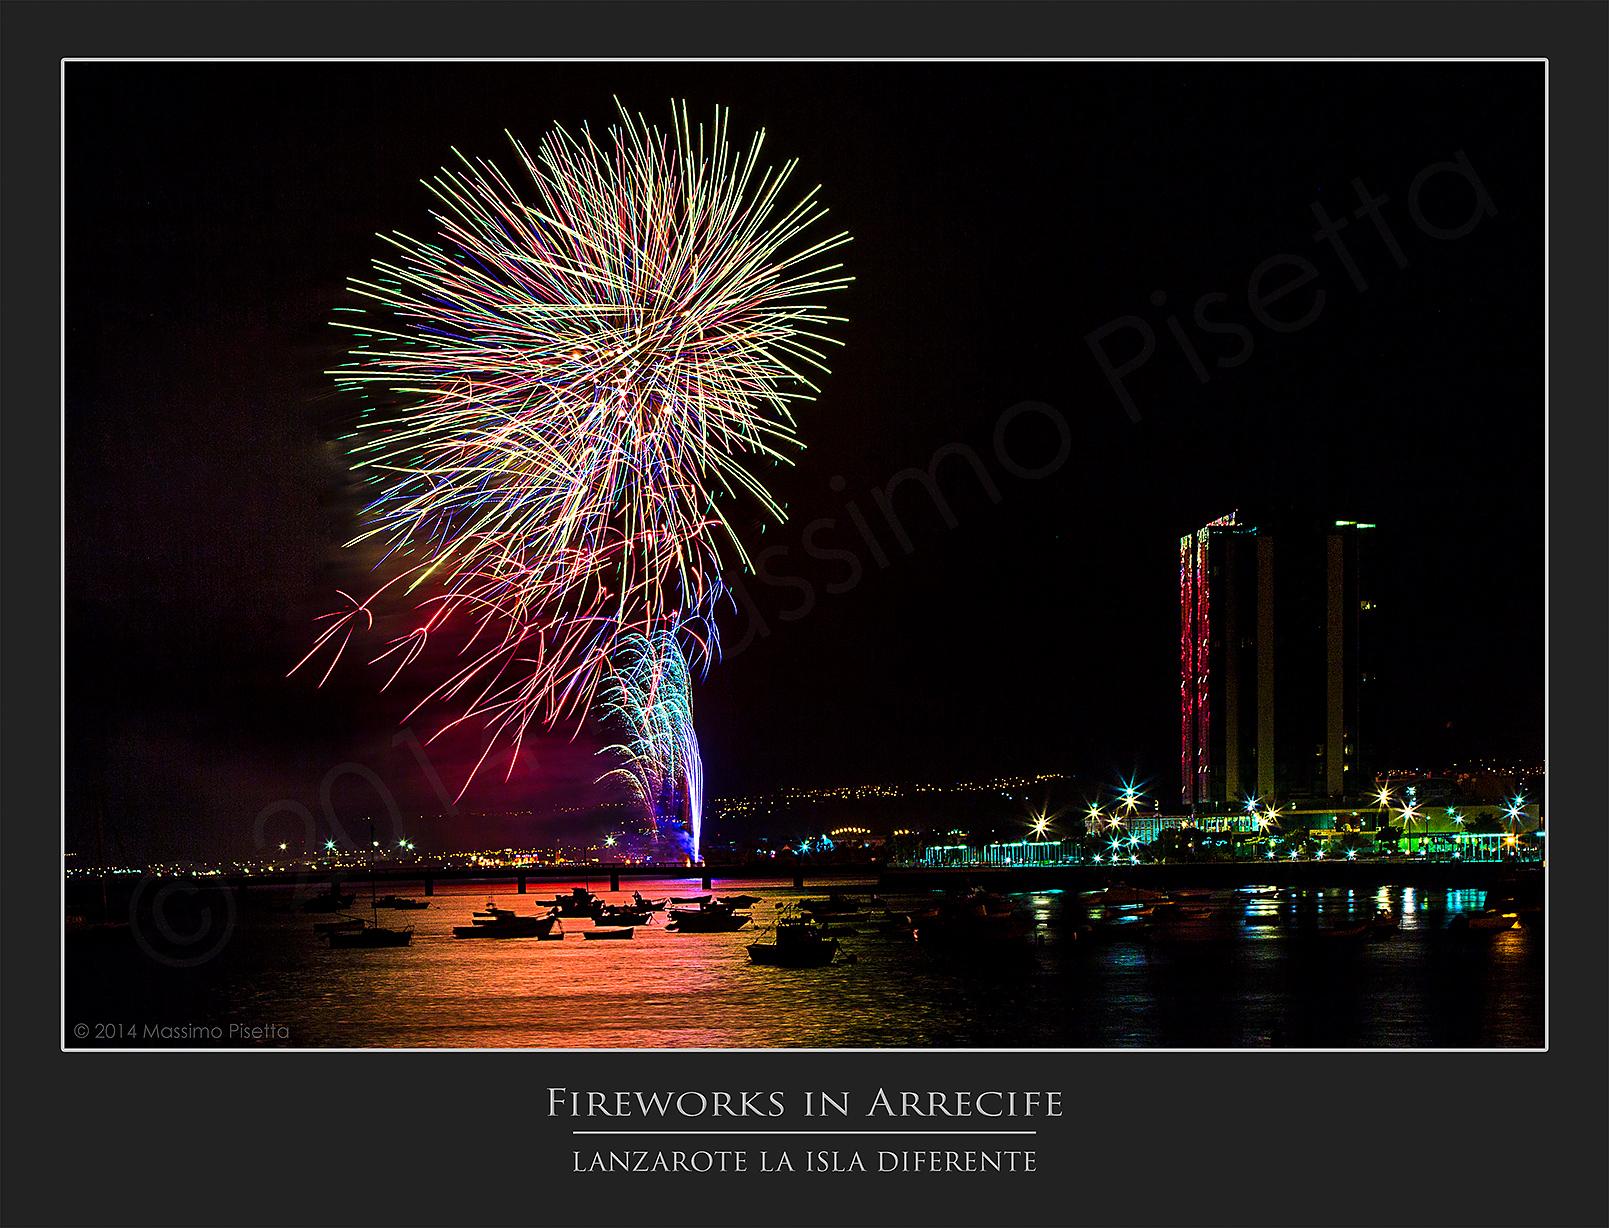 Fireworks @Arrecife